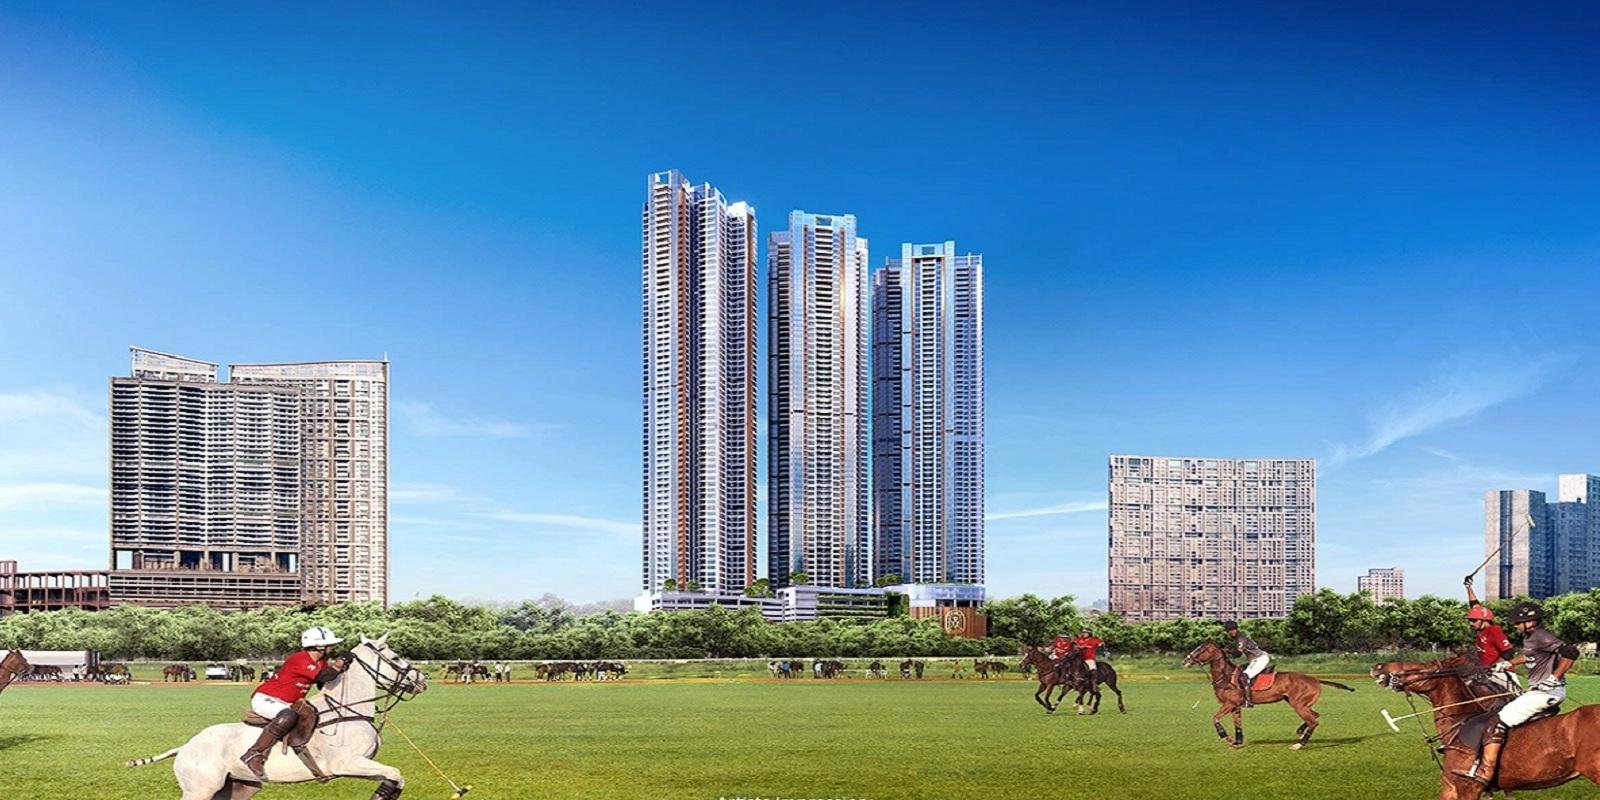 piramal mahalaxmi north tower project project large image1